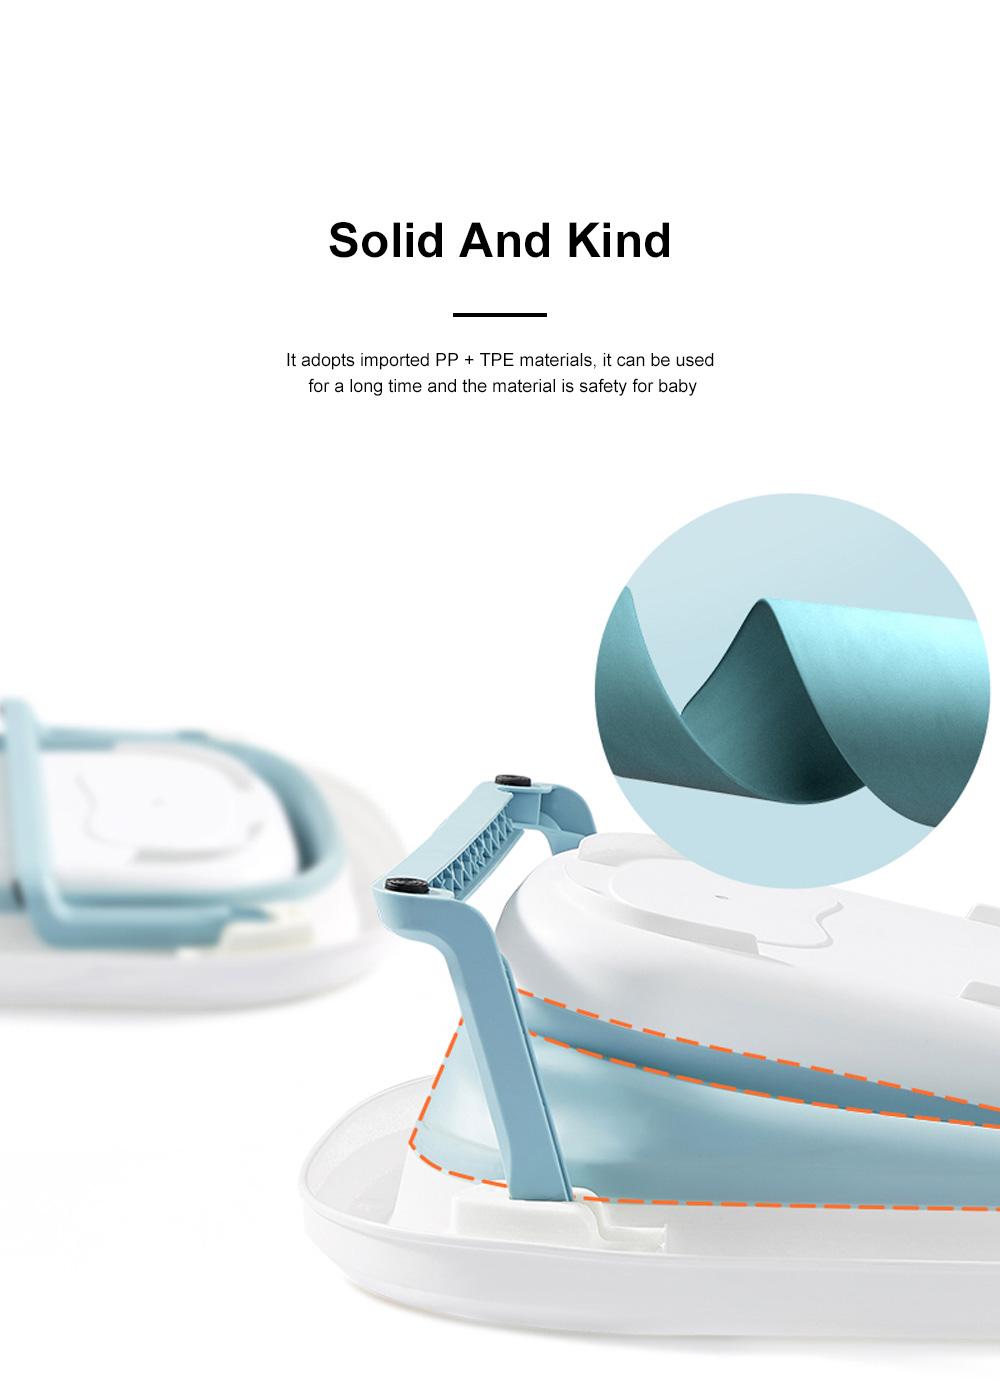 Portable Folding Baby Bath Tub Anti-Slip Bottom Non-Toxic Material Children Bathtub Bucket For Baby within 5 Year Old 3